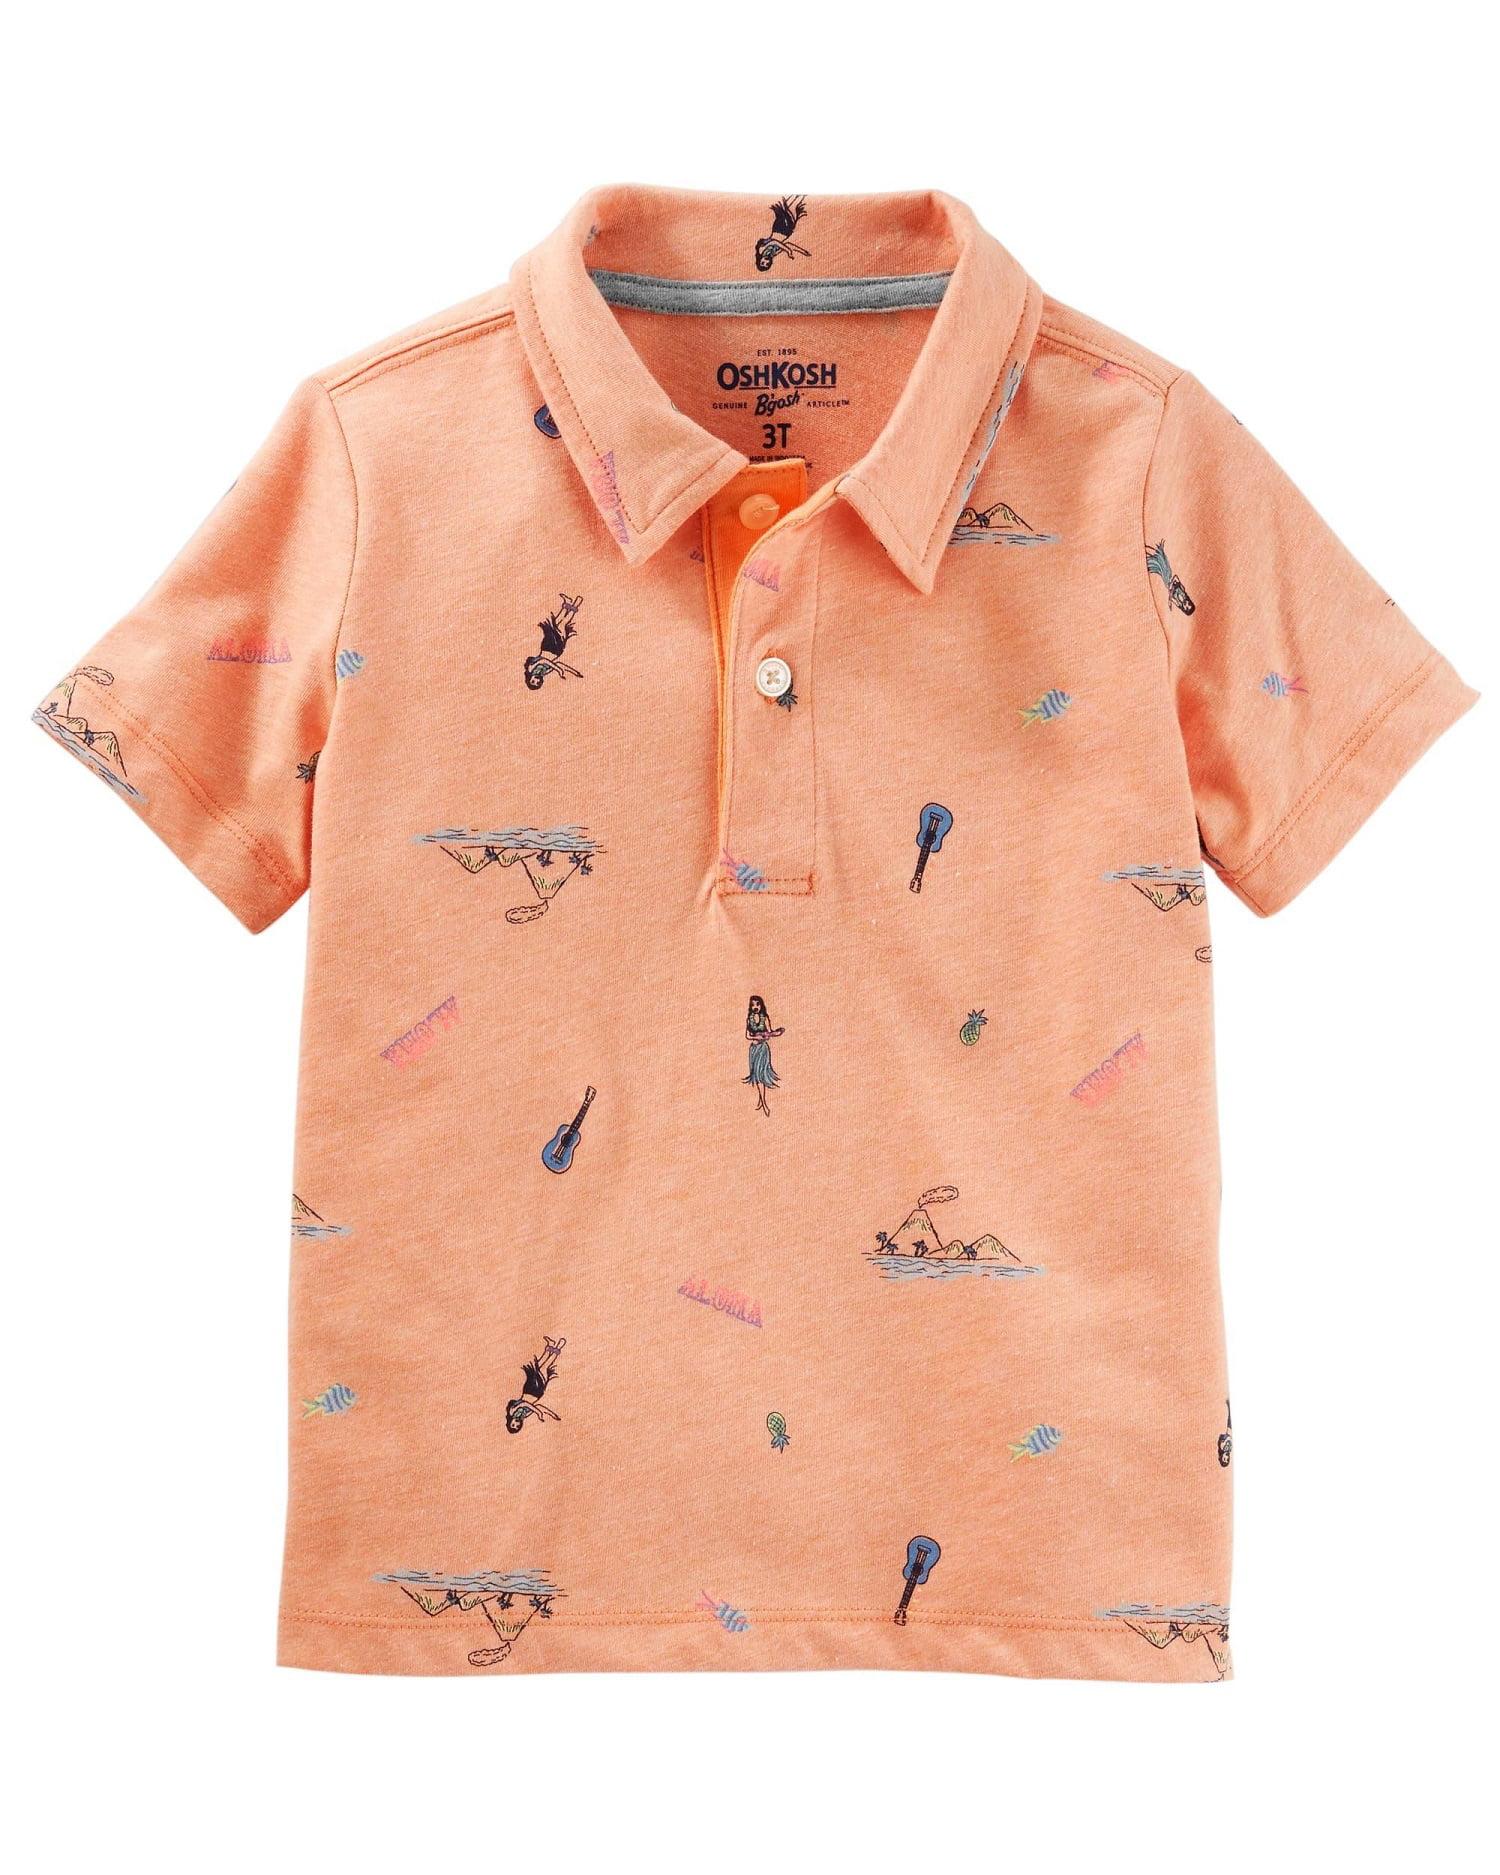 OshKosh B'gosh Little Boys' Luau Jersey Polo